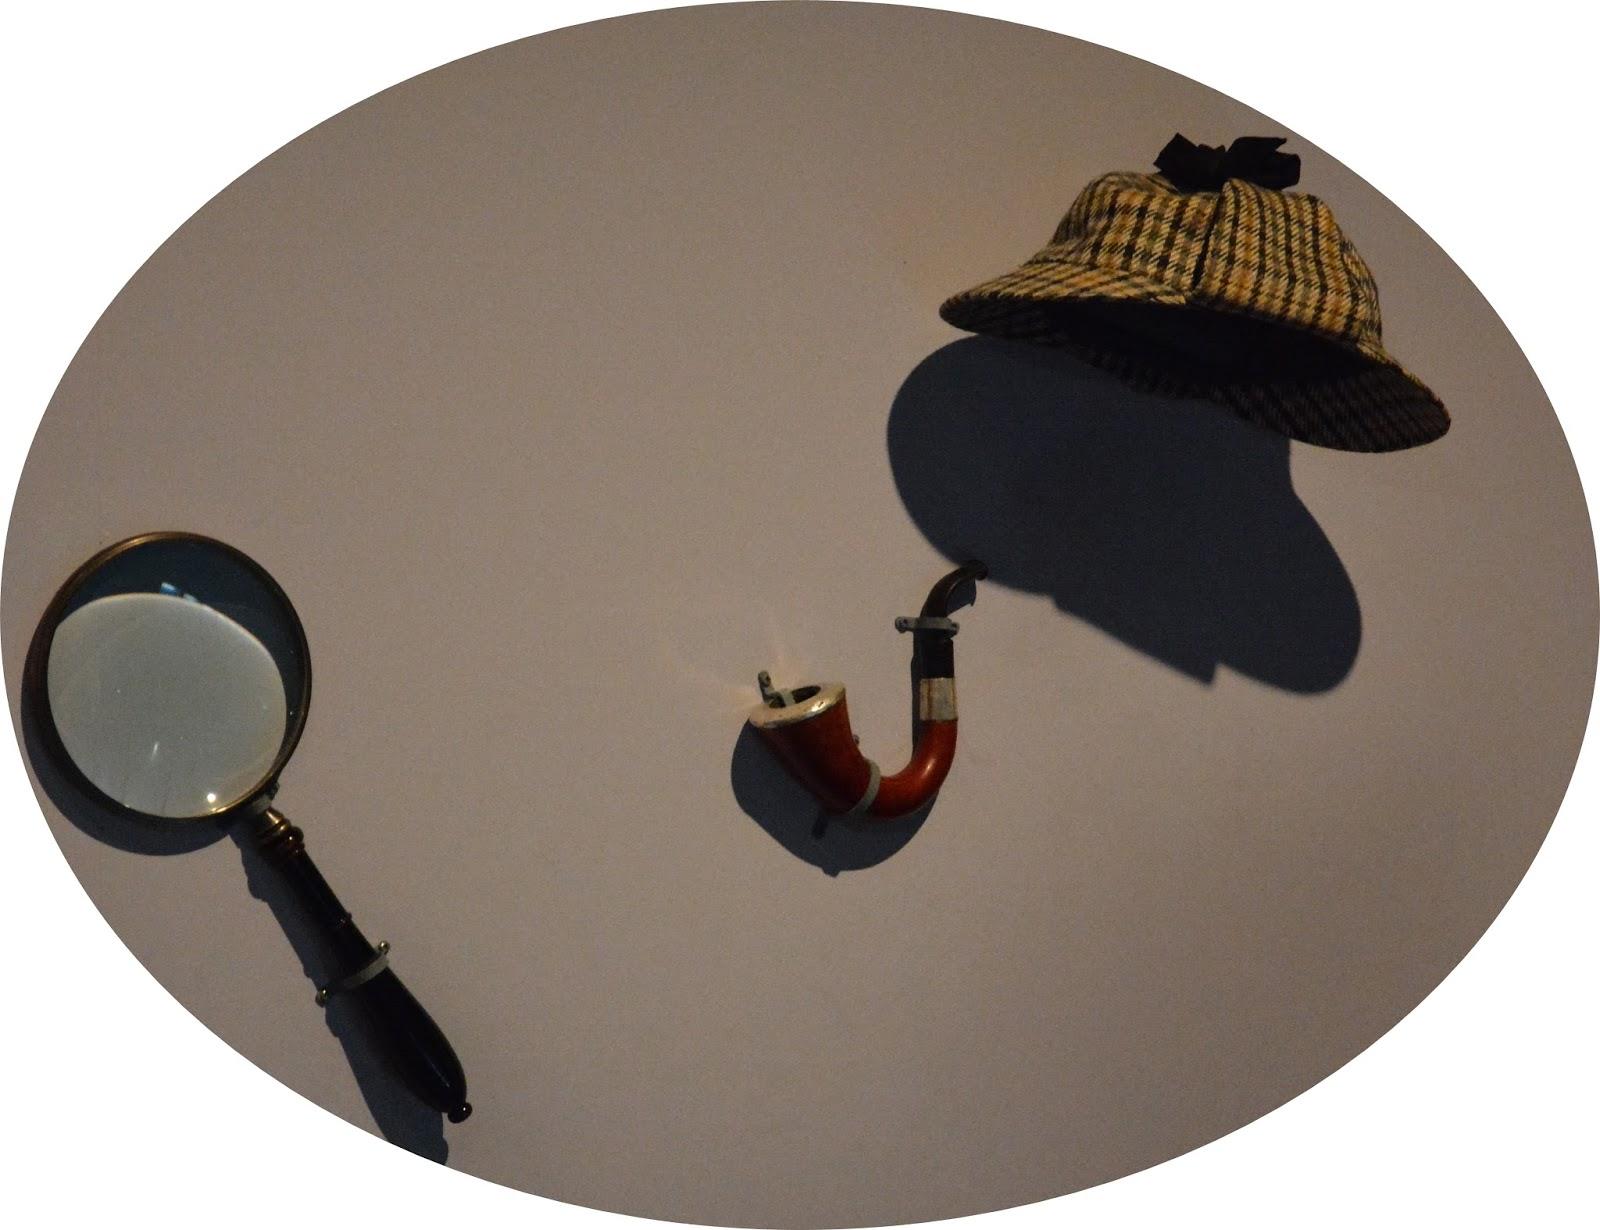 Szlakiem Sherlocka Holmesa i Arthura Connan Doyla w Londynie cz.1 Sherlock Holmes LONDYN